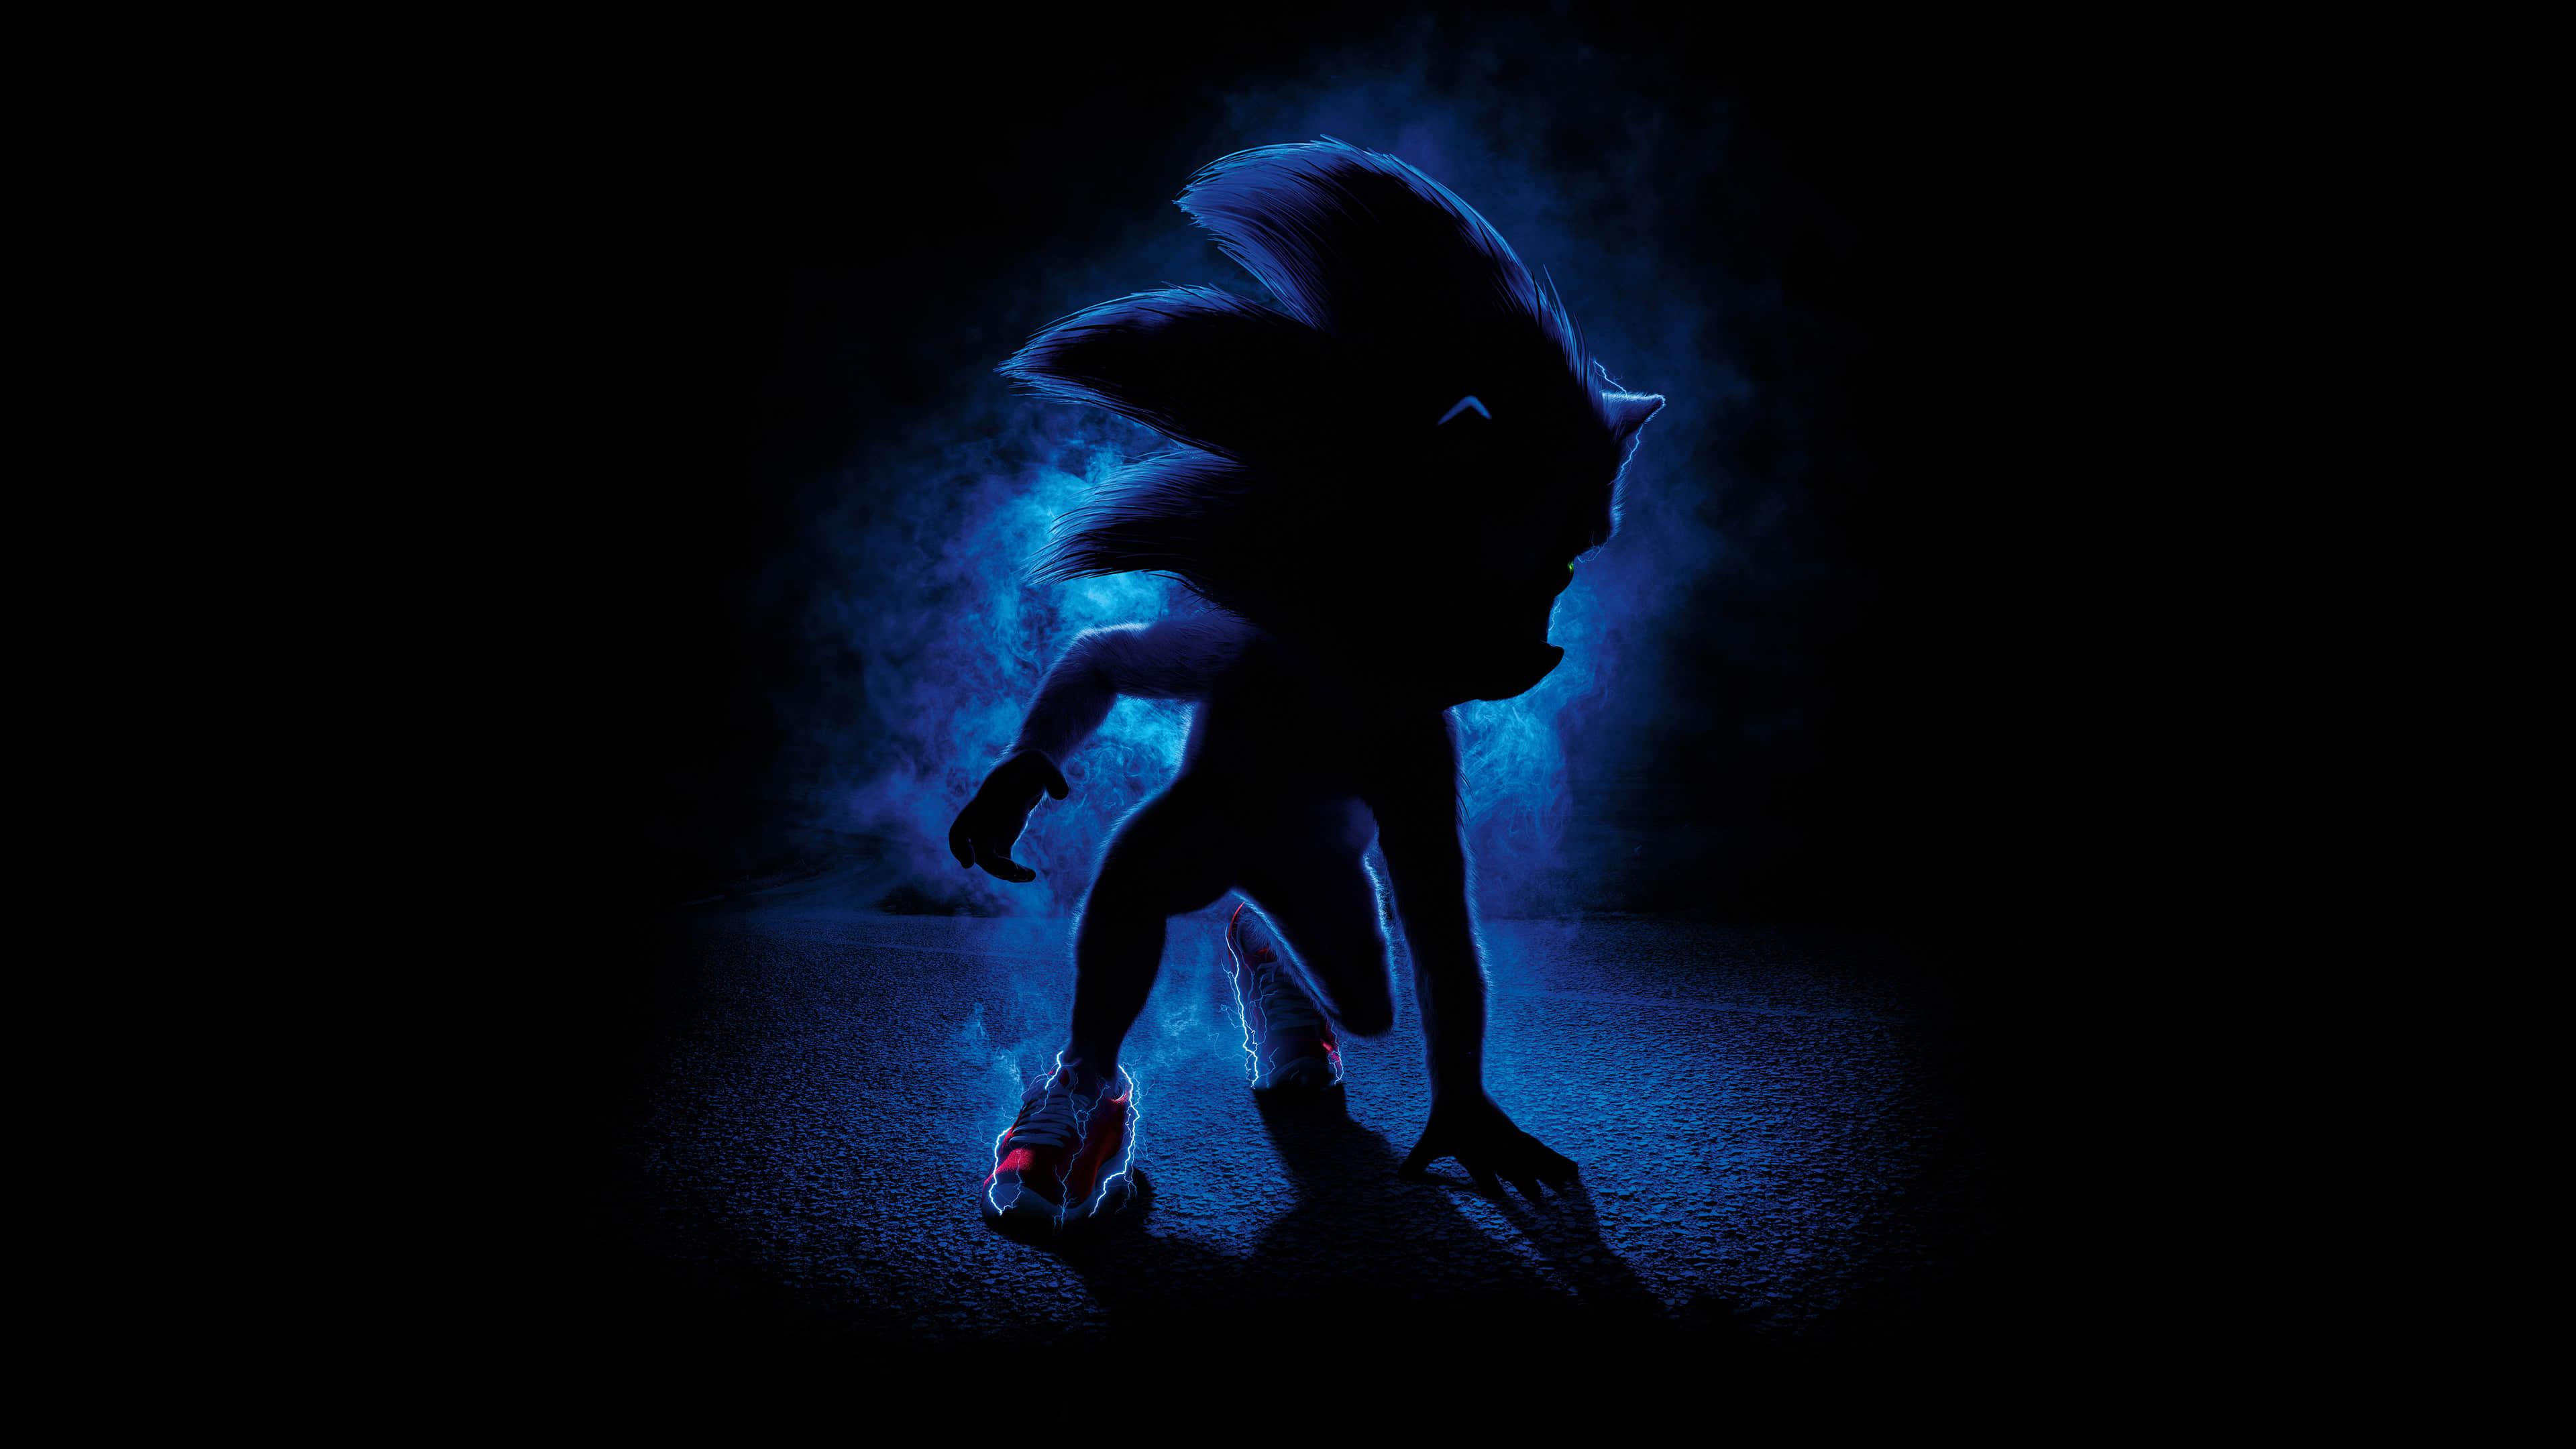 Sonic The Hedgehog Movie UHD 4K Wallpaper Pixelz 3840x2160